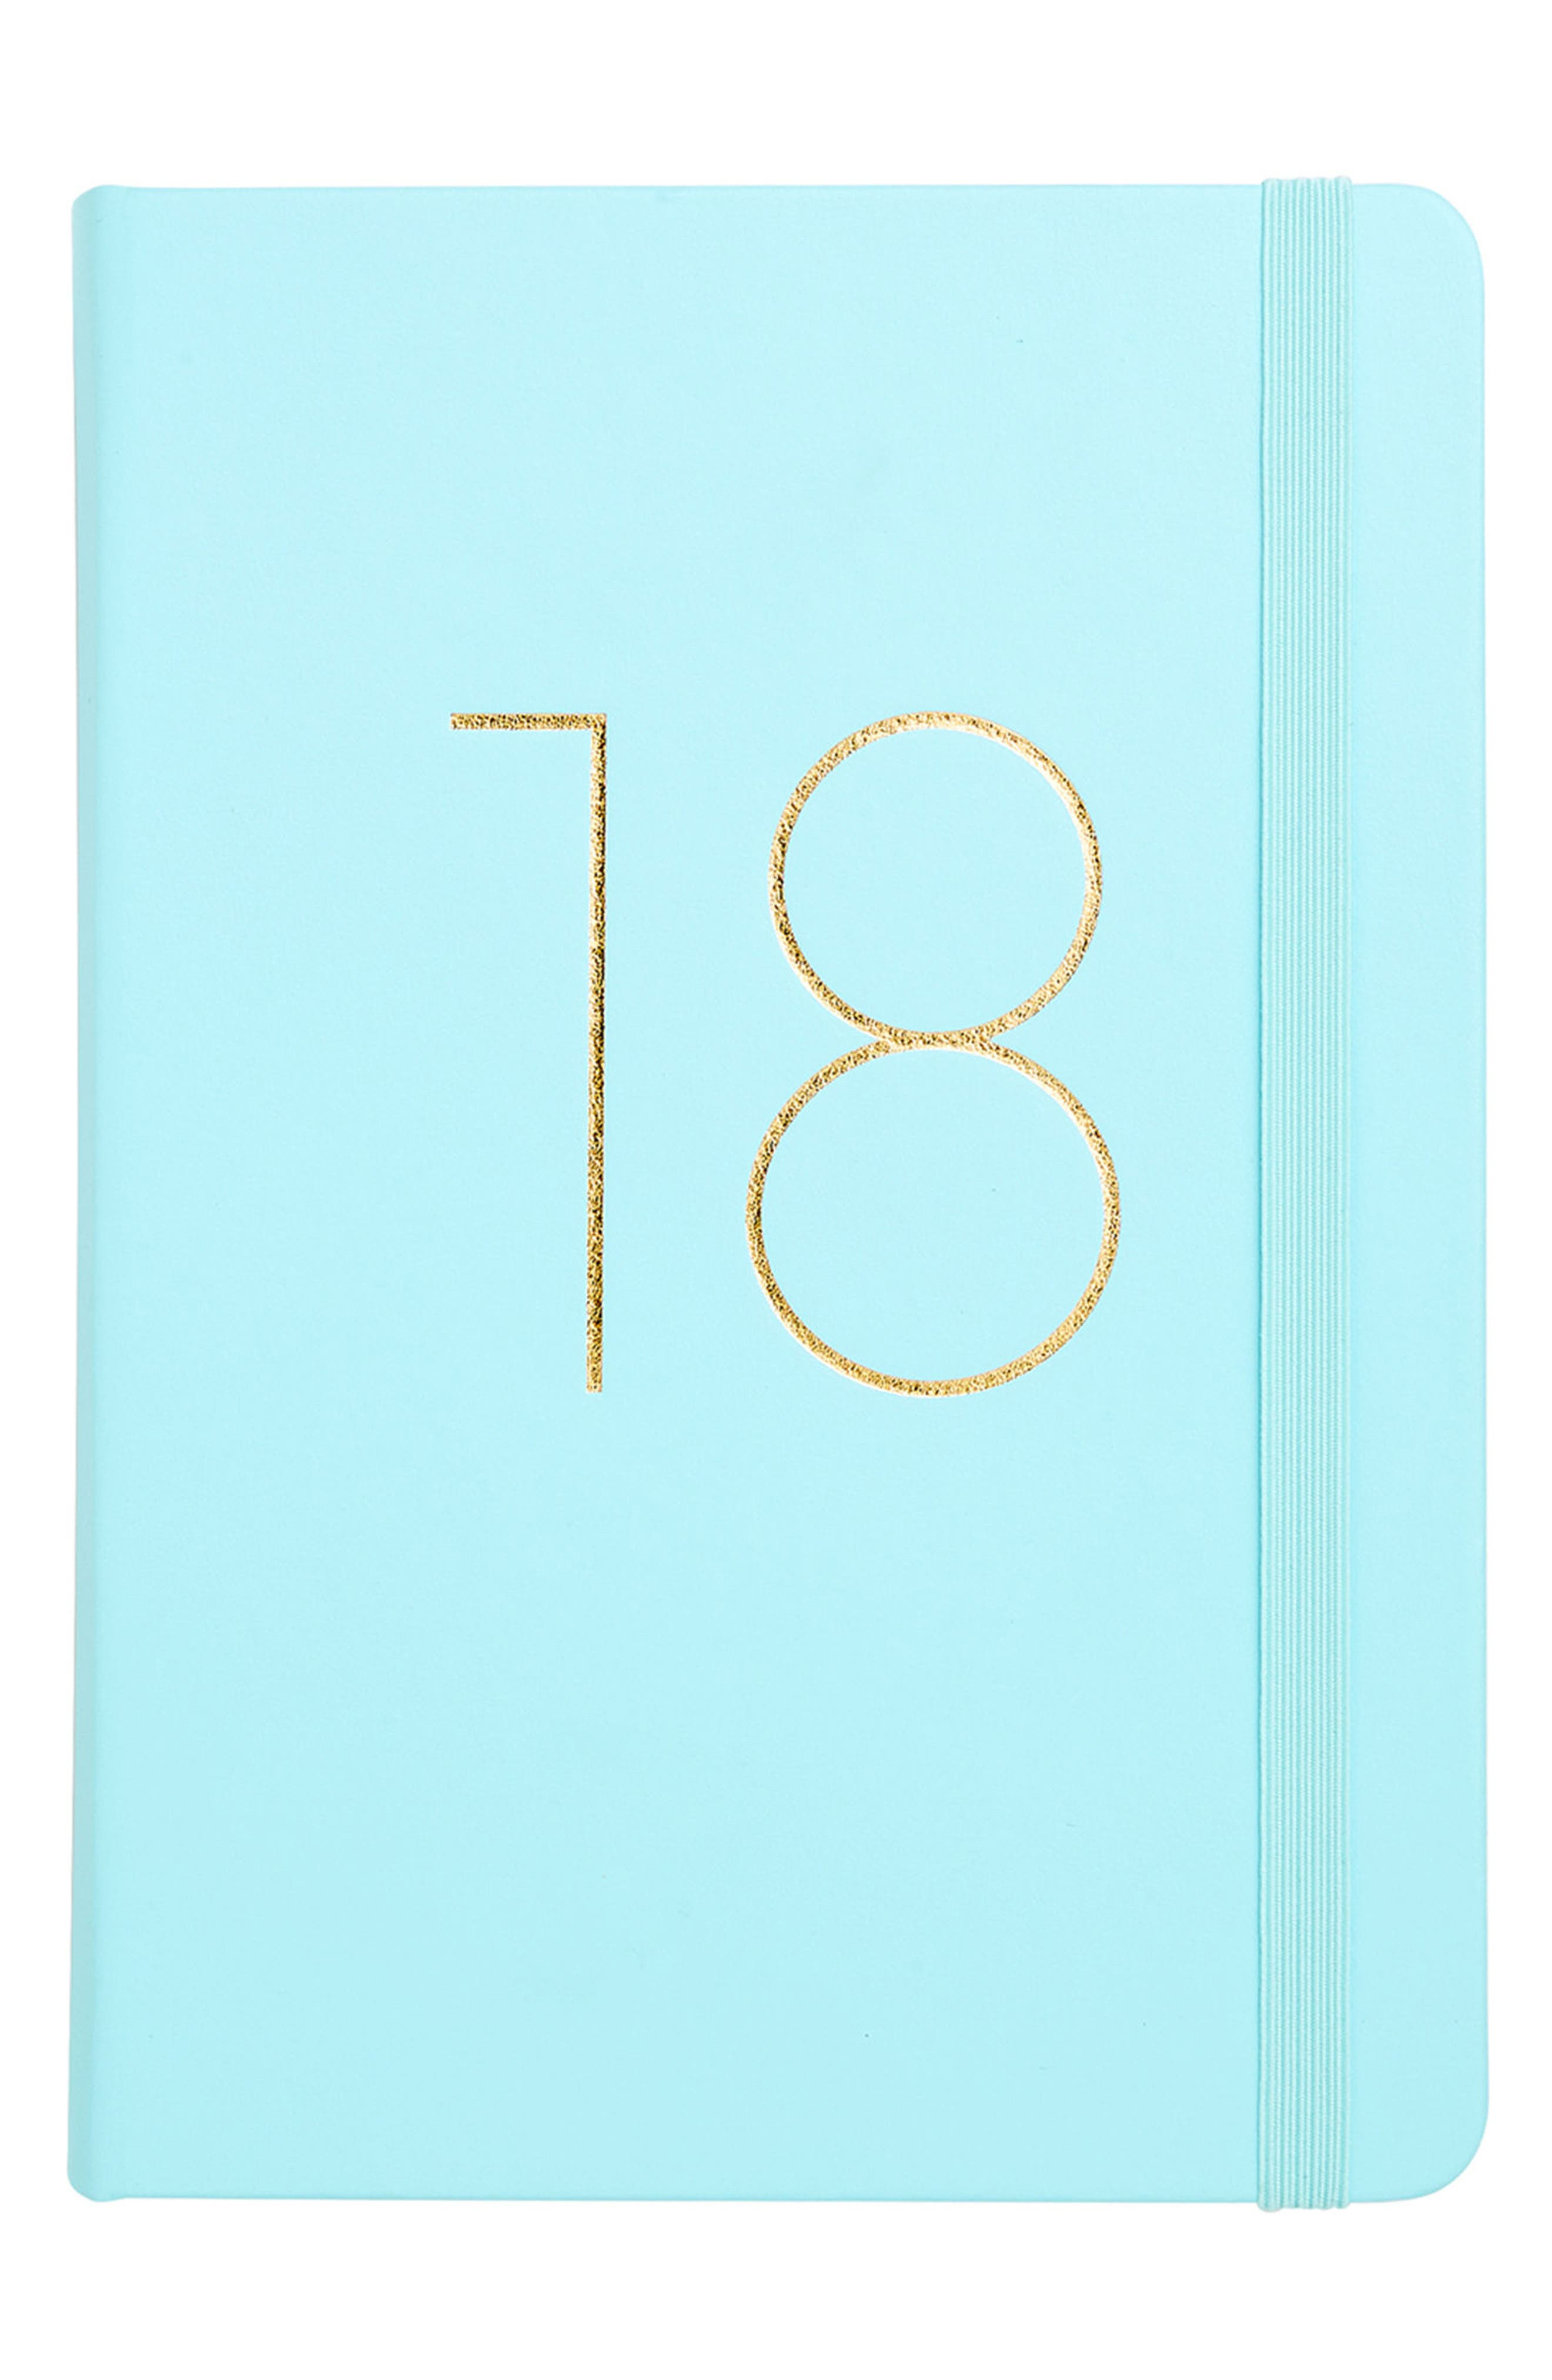 Main Image - kikki.K 2018 Leather Weekly Diary